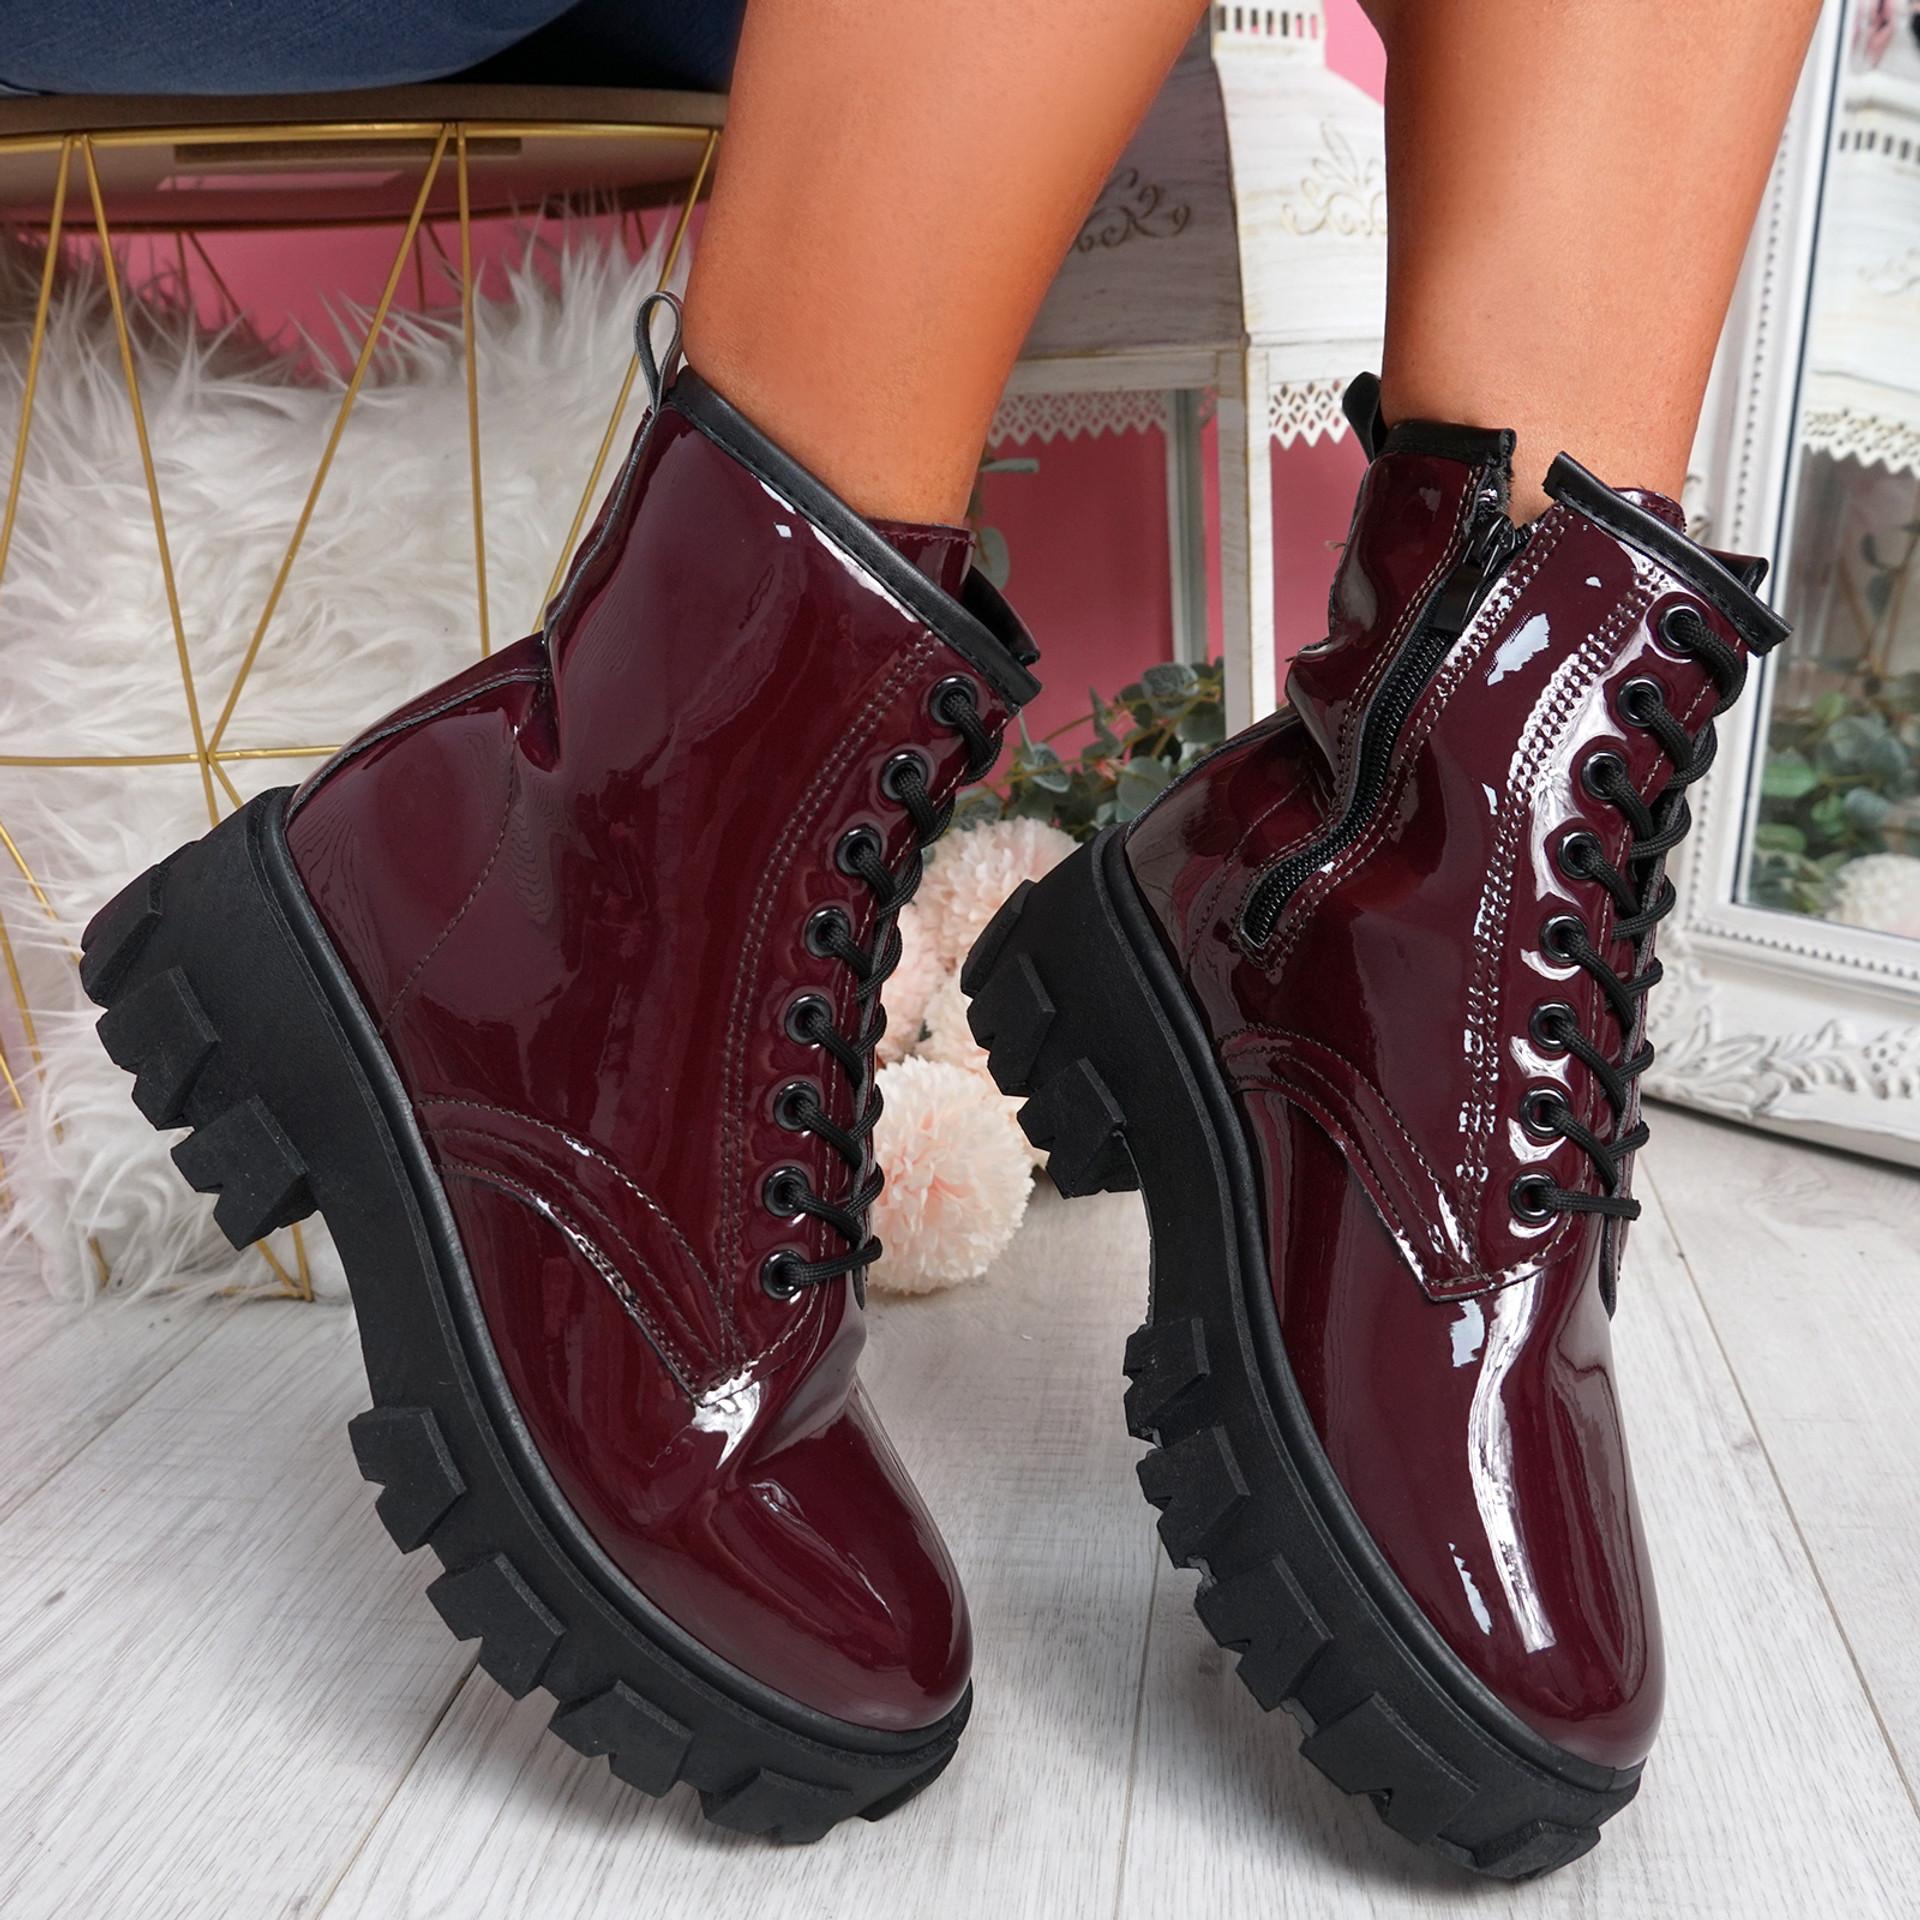 Fova Wine Zip Ankle Boots